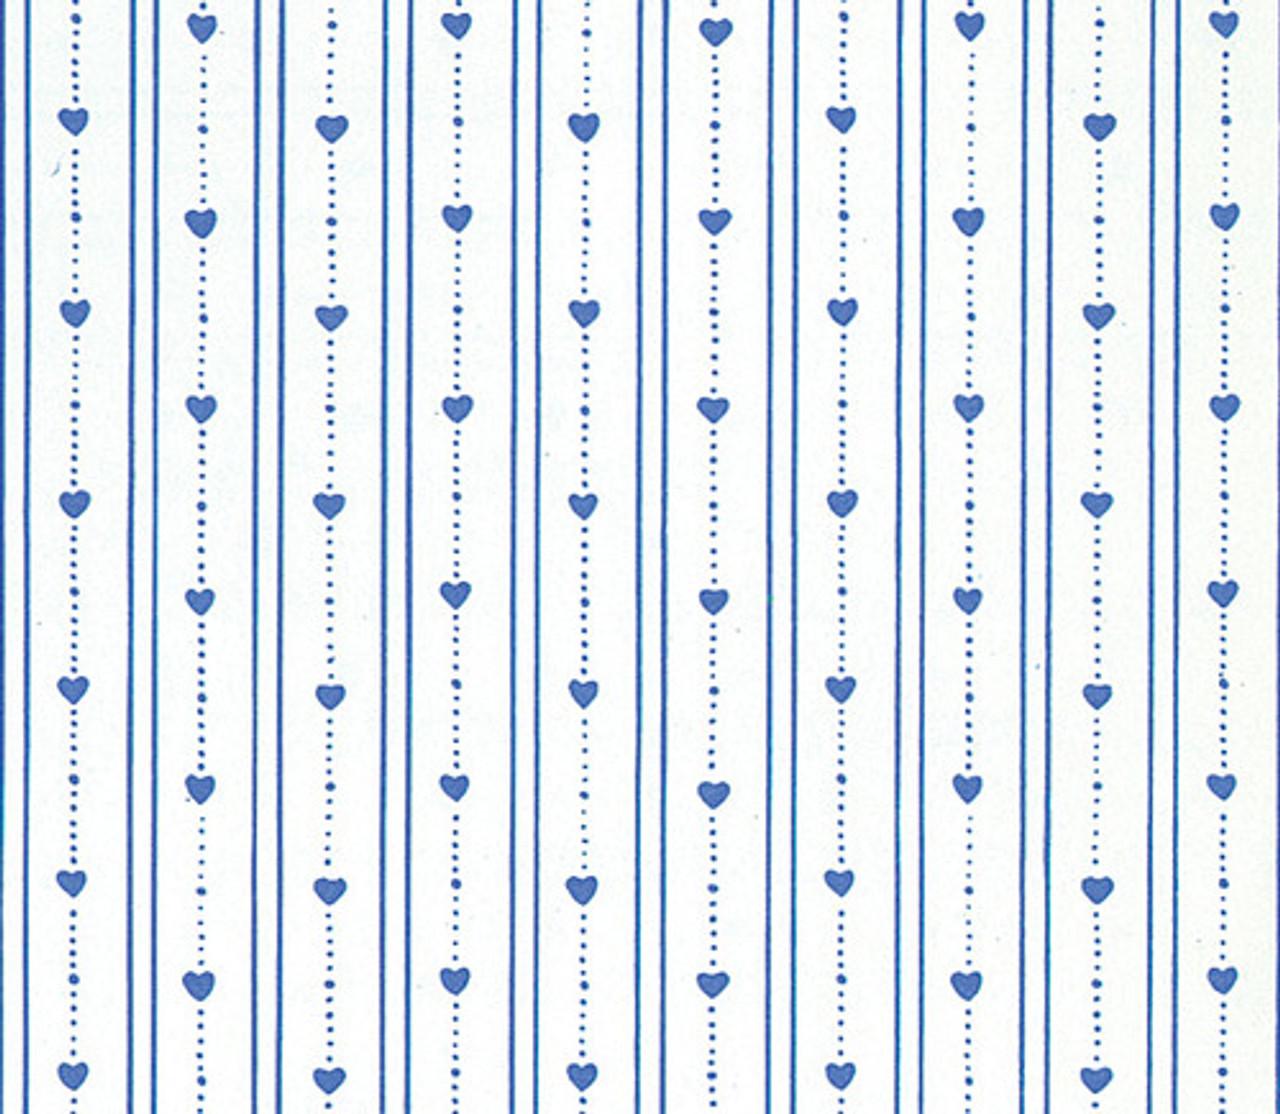 Wallpaper Bearly Hearts Set - Dark Blue